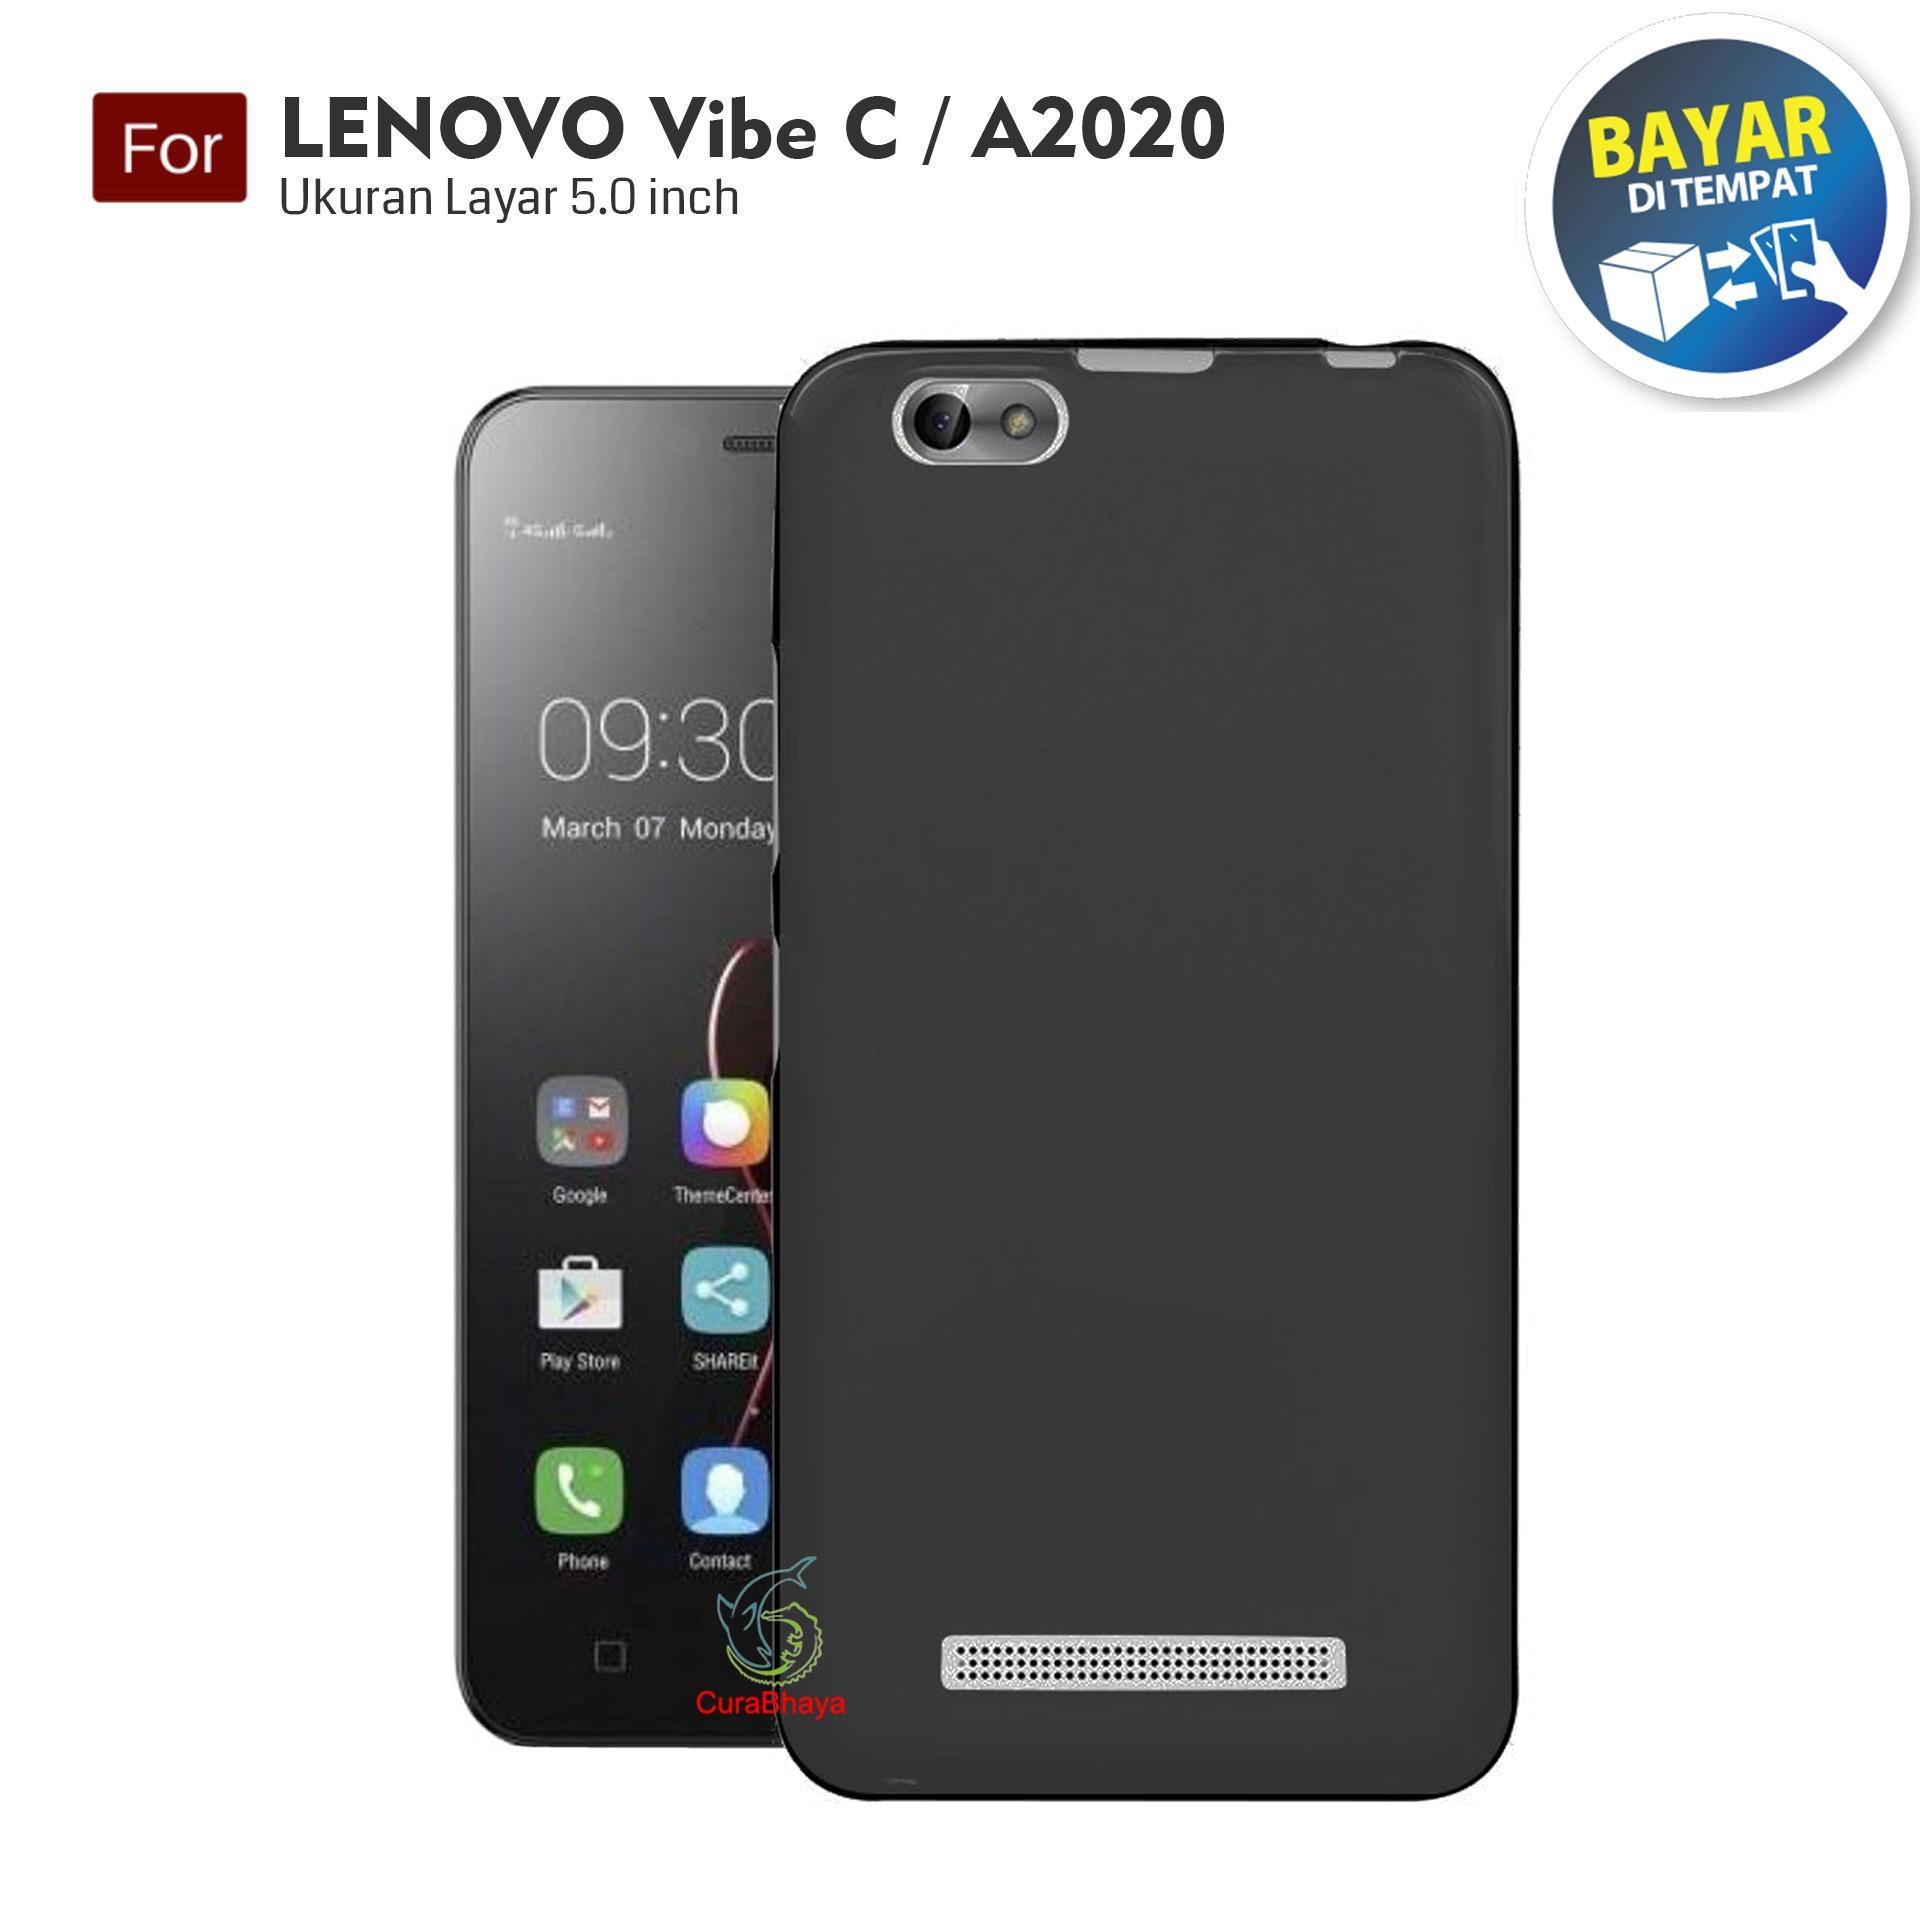 MidNight Lenovo Vibe C / A2020 | Slim Case Black Matte Softcase Premium Baby Skin -